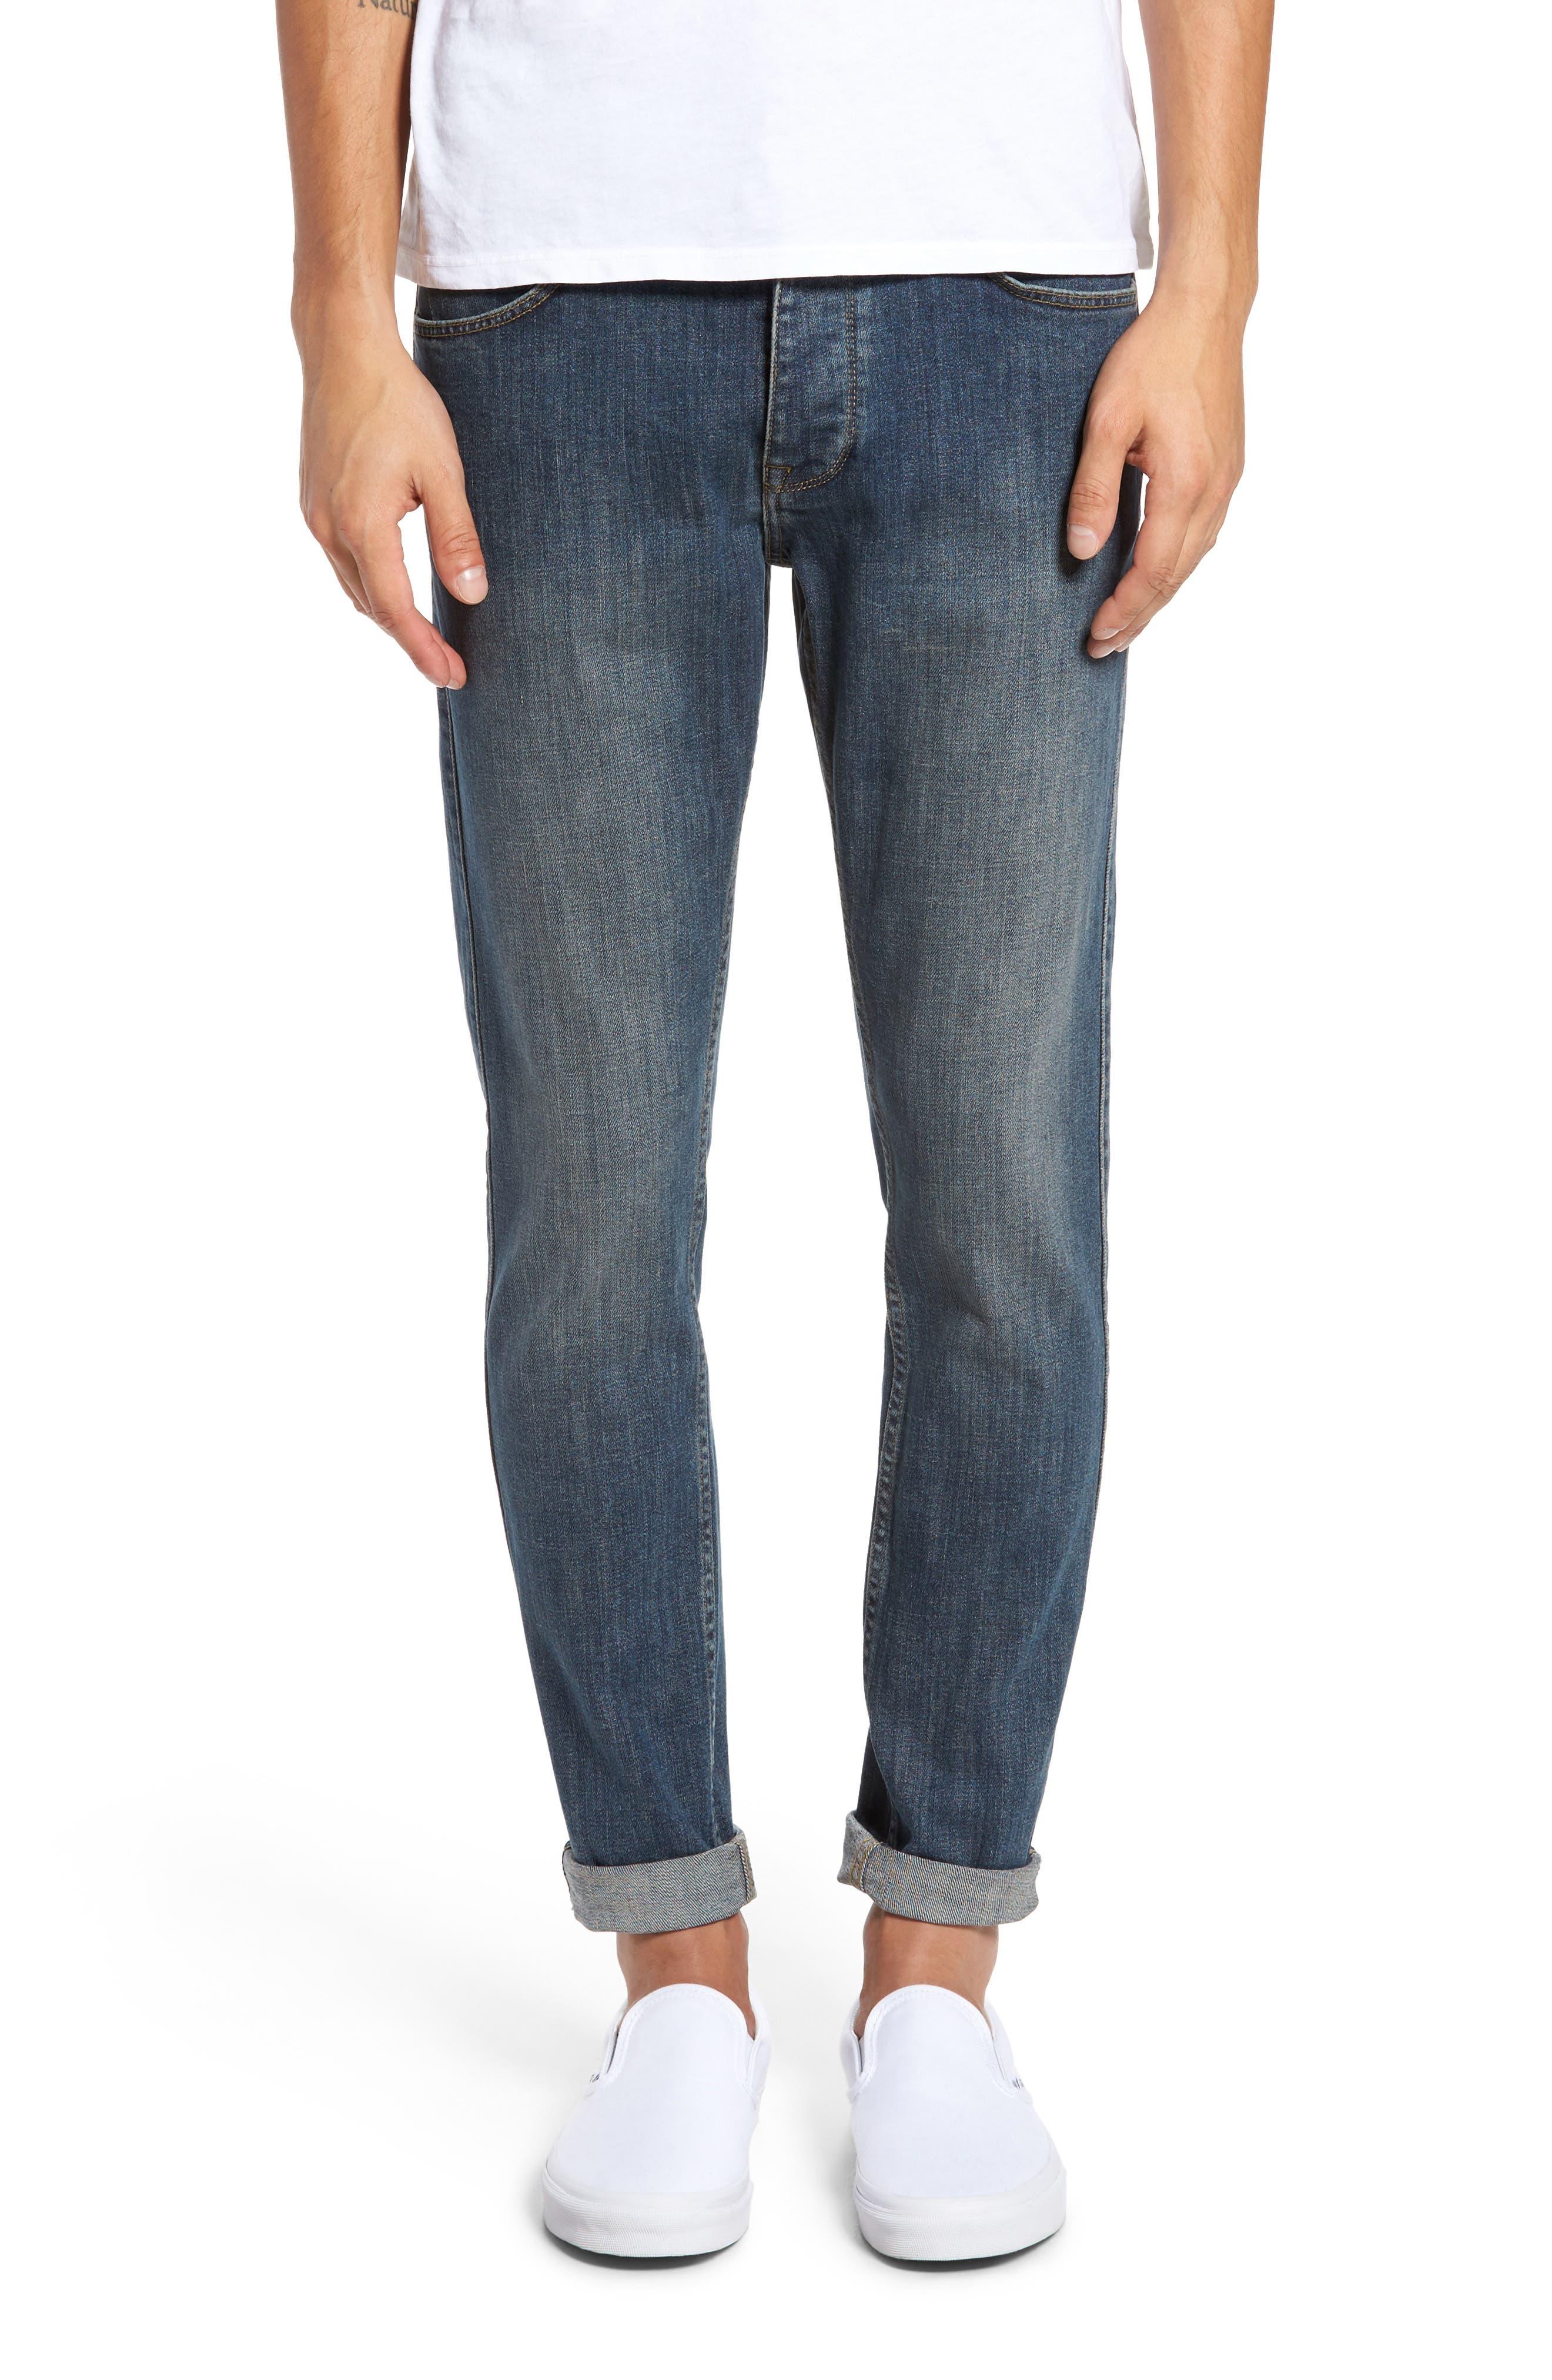 Main Image - Dr. Denim Supply Co. Clark Slim Straight Leg Jeans (90s Mid Blue)